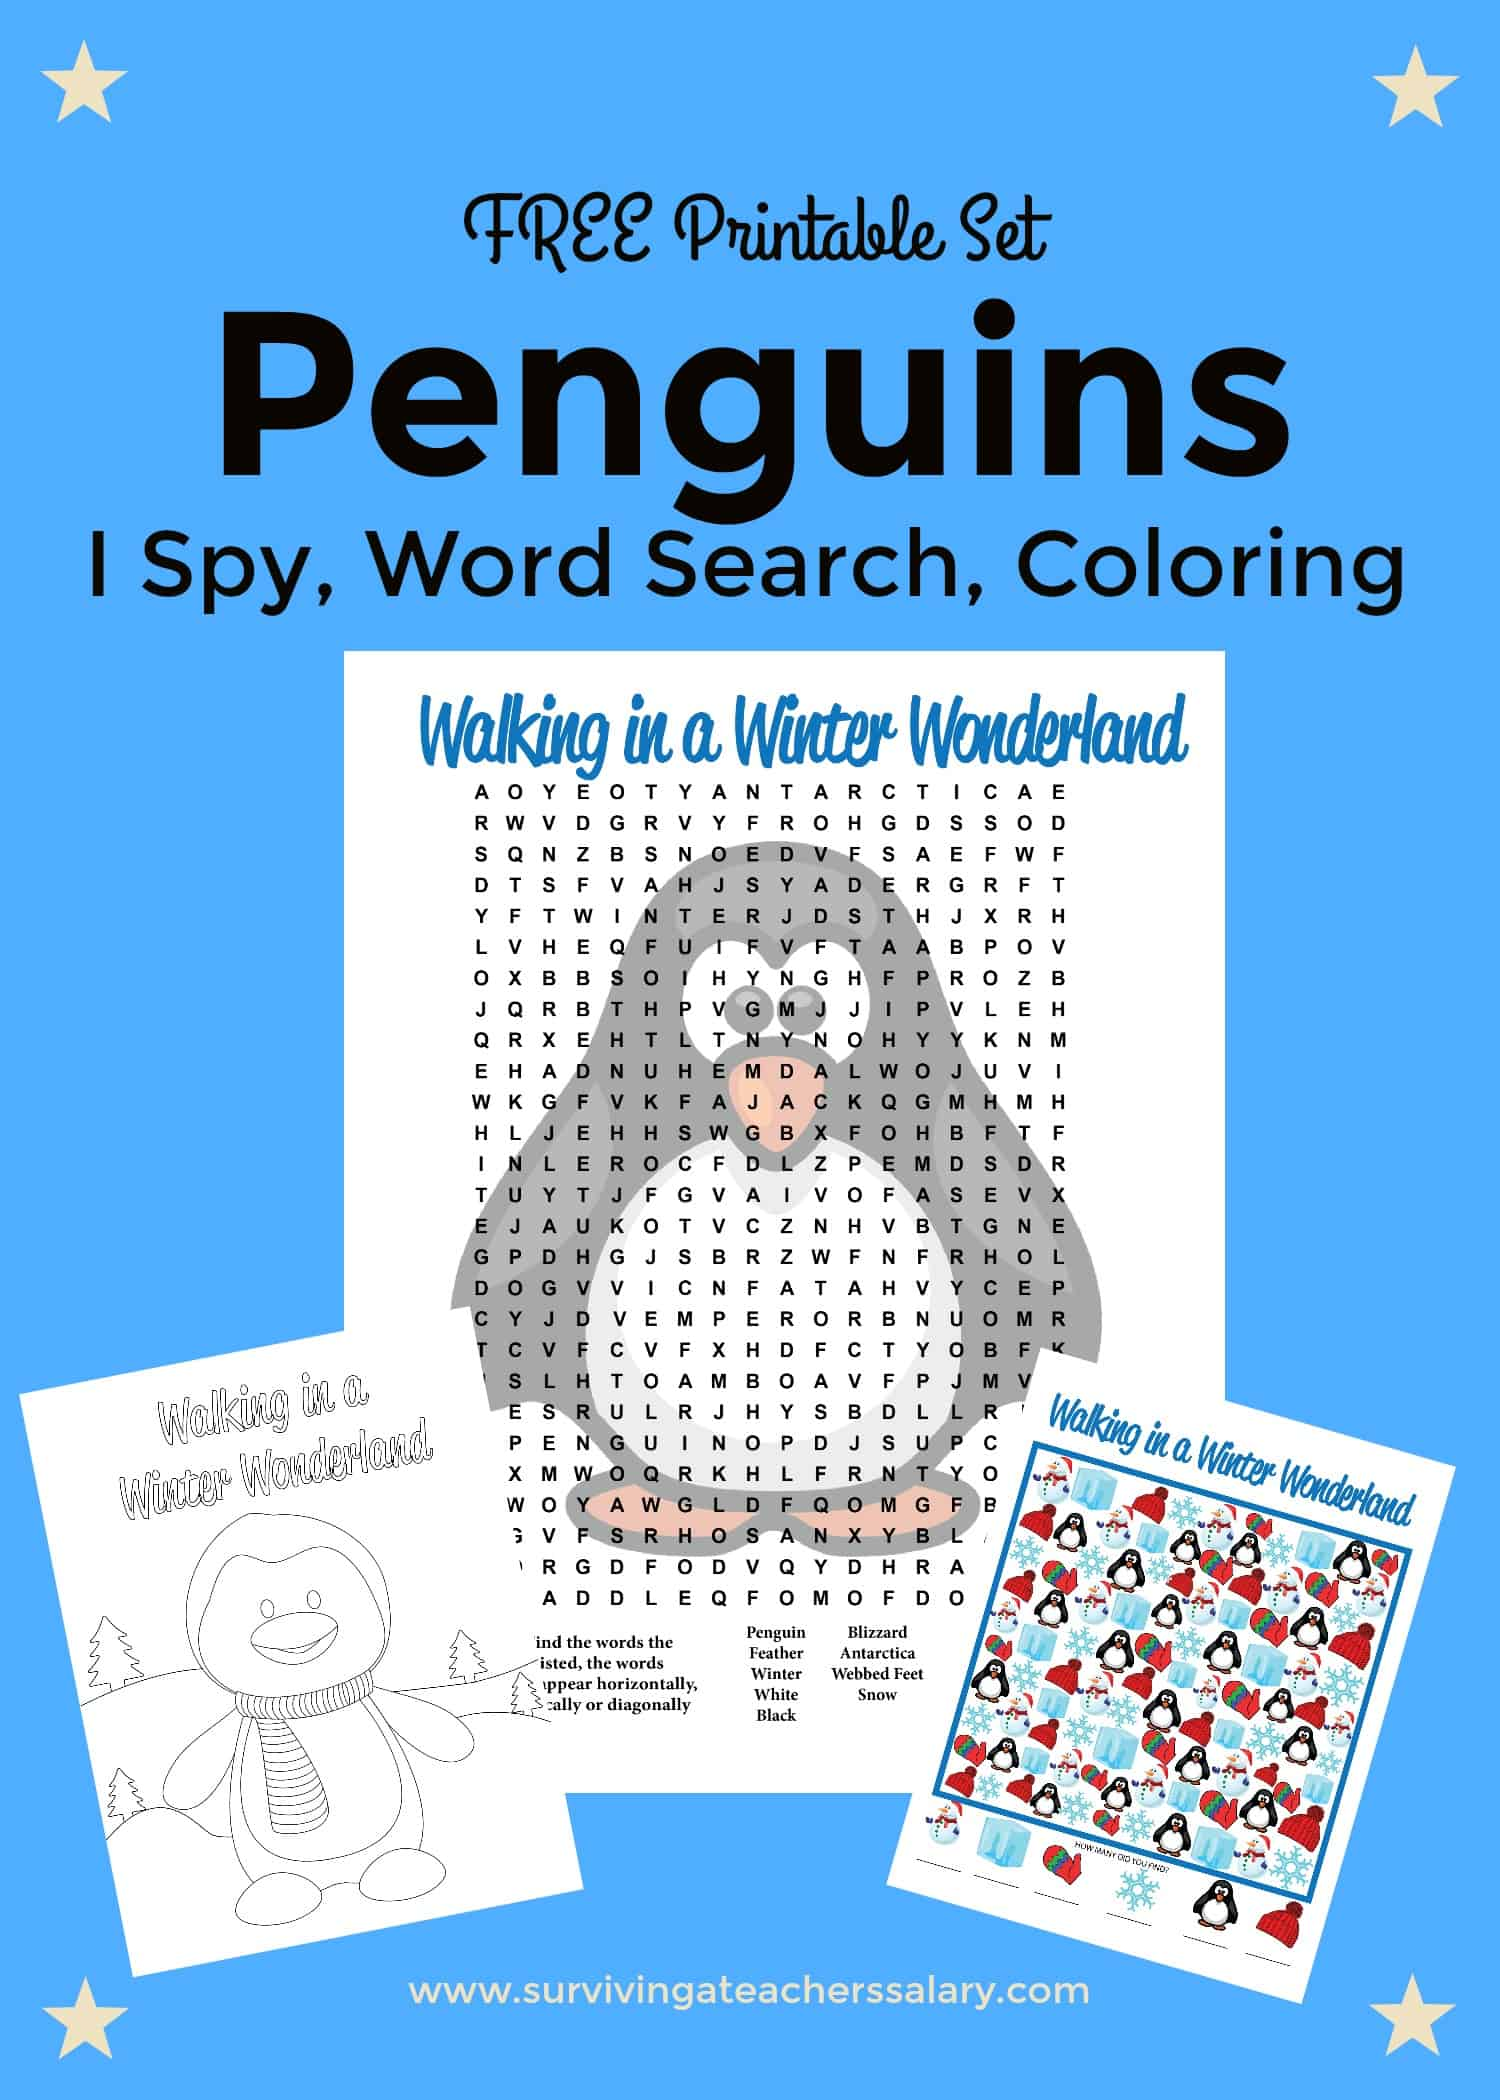 Free Printable Penguins Worksheets